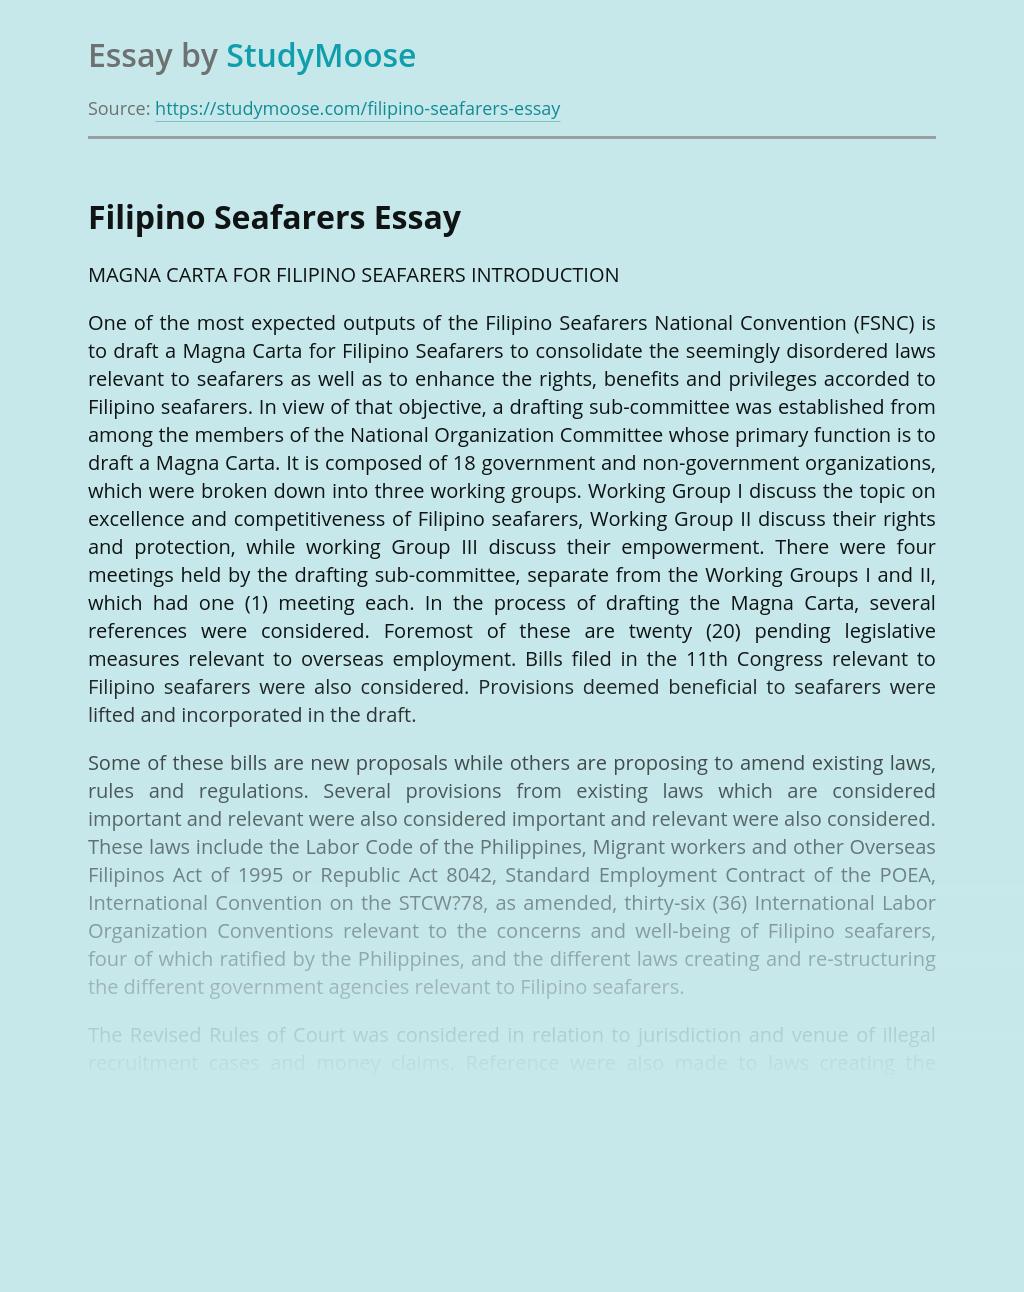 Filipino Seafarers